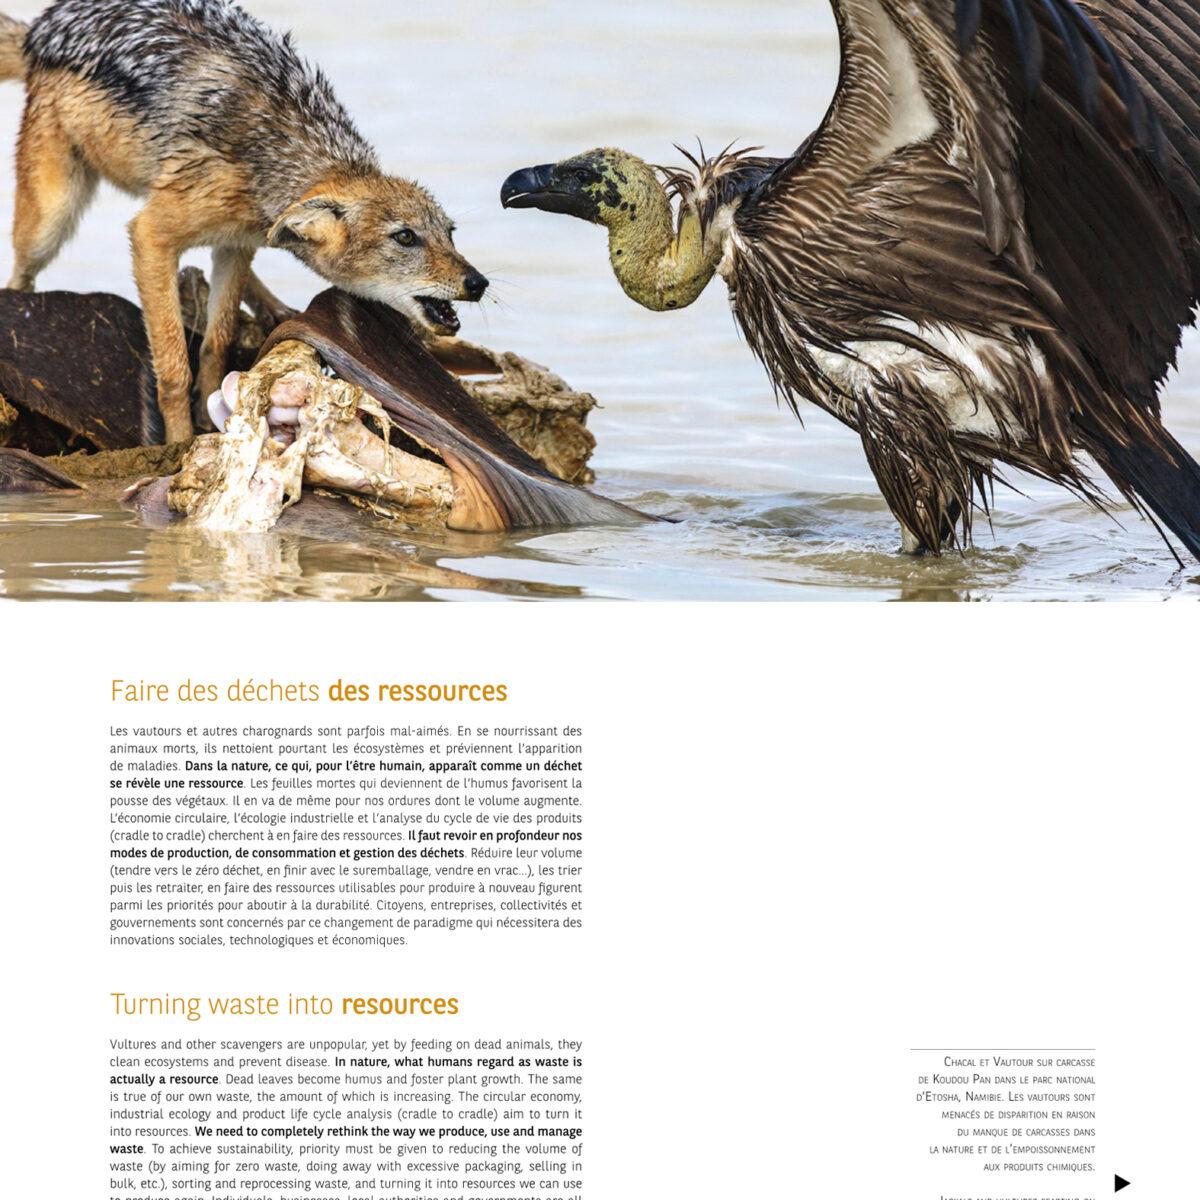 chacal vautour Namibie